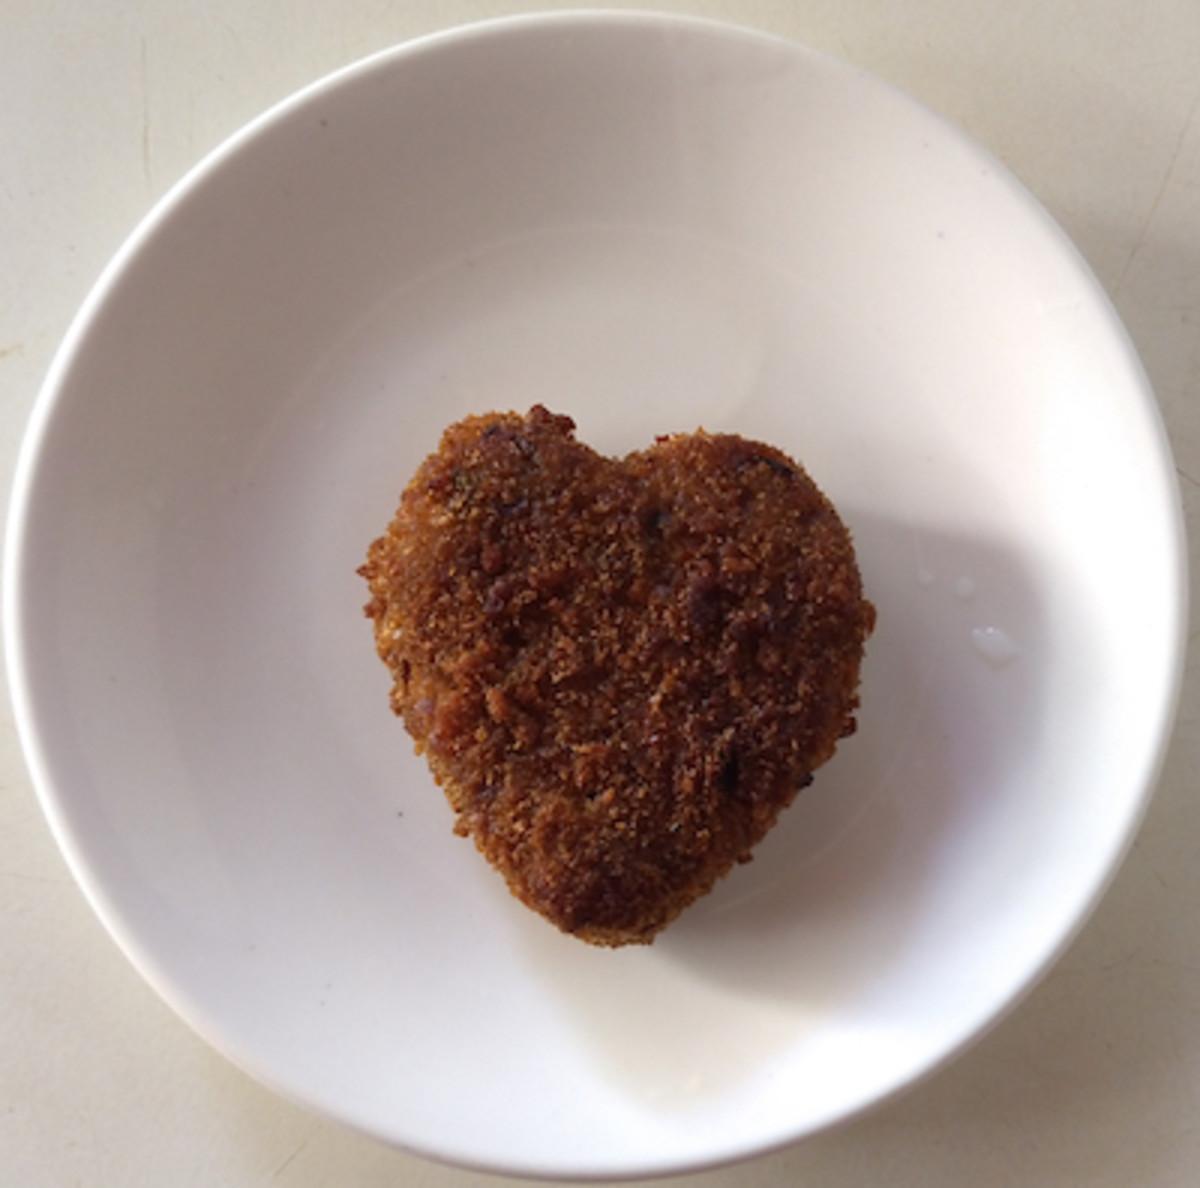 Heart-shaped mini meatloaf